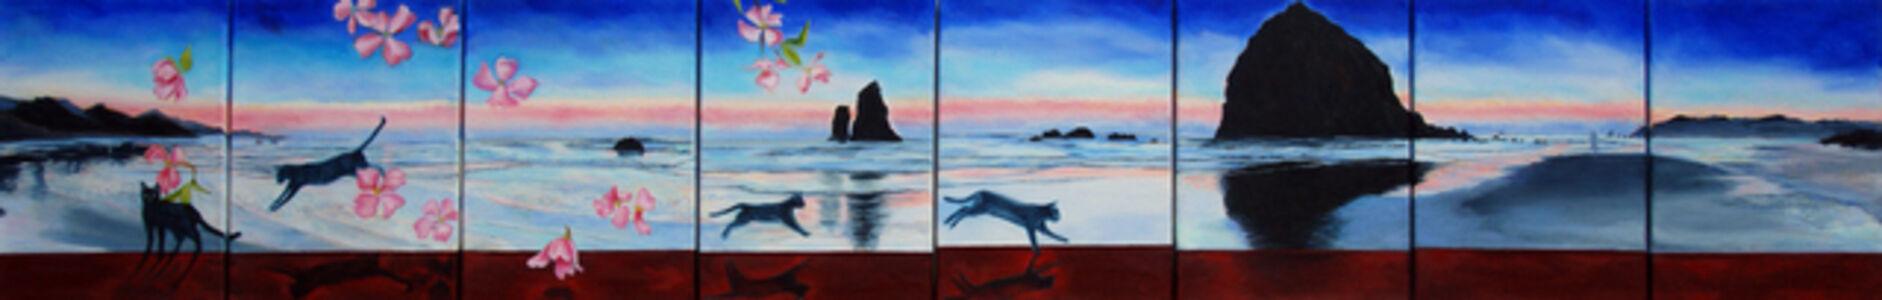 Katherine Pappas-Parks, 'The Horizon's Light VIII', 2012